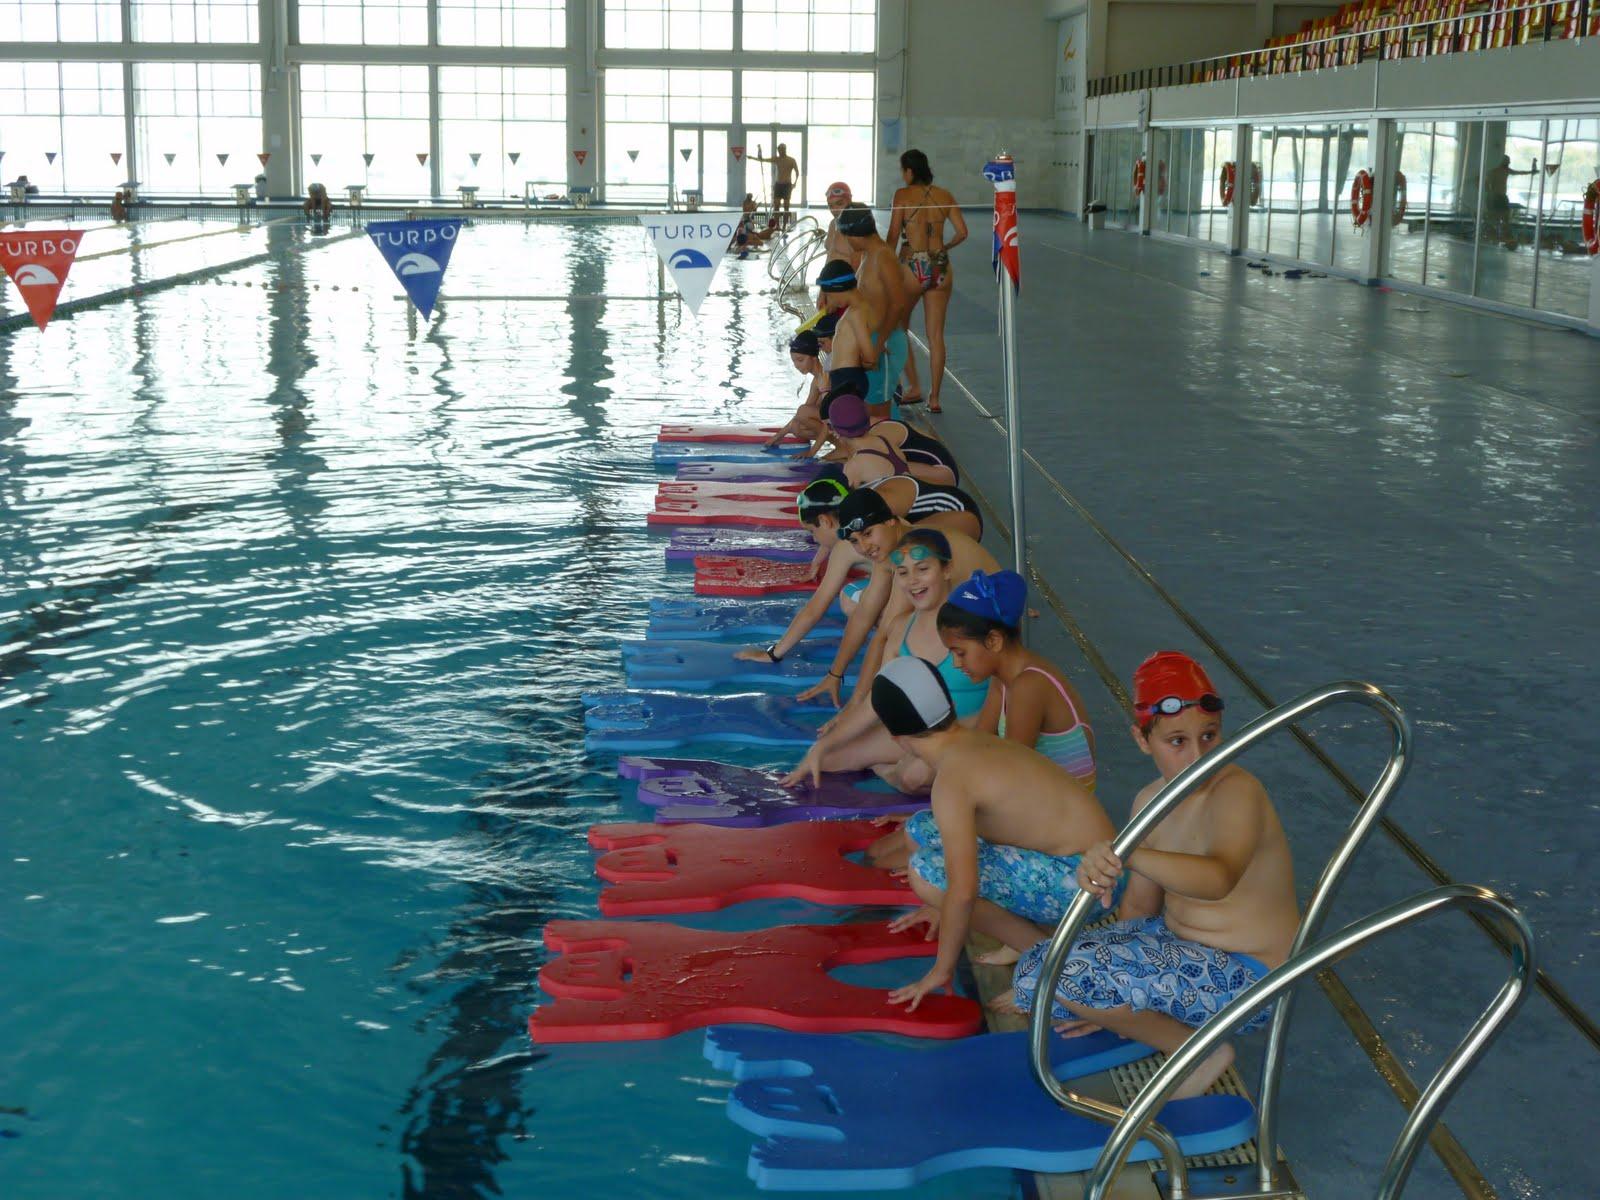 juegos de piscina recreativos